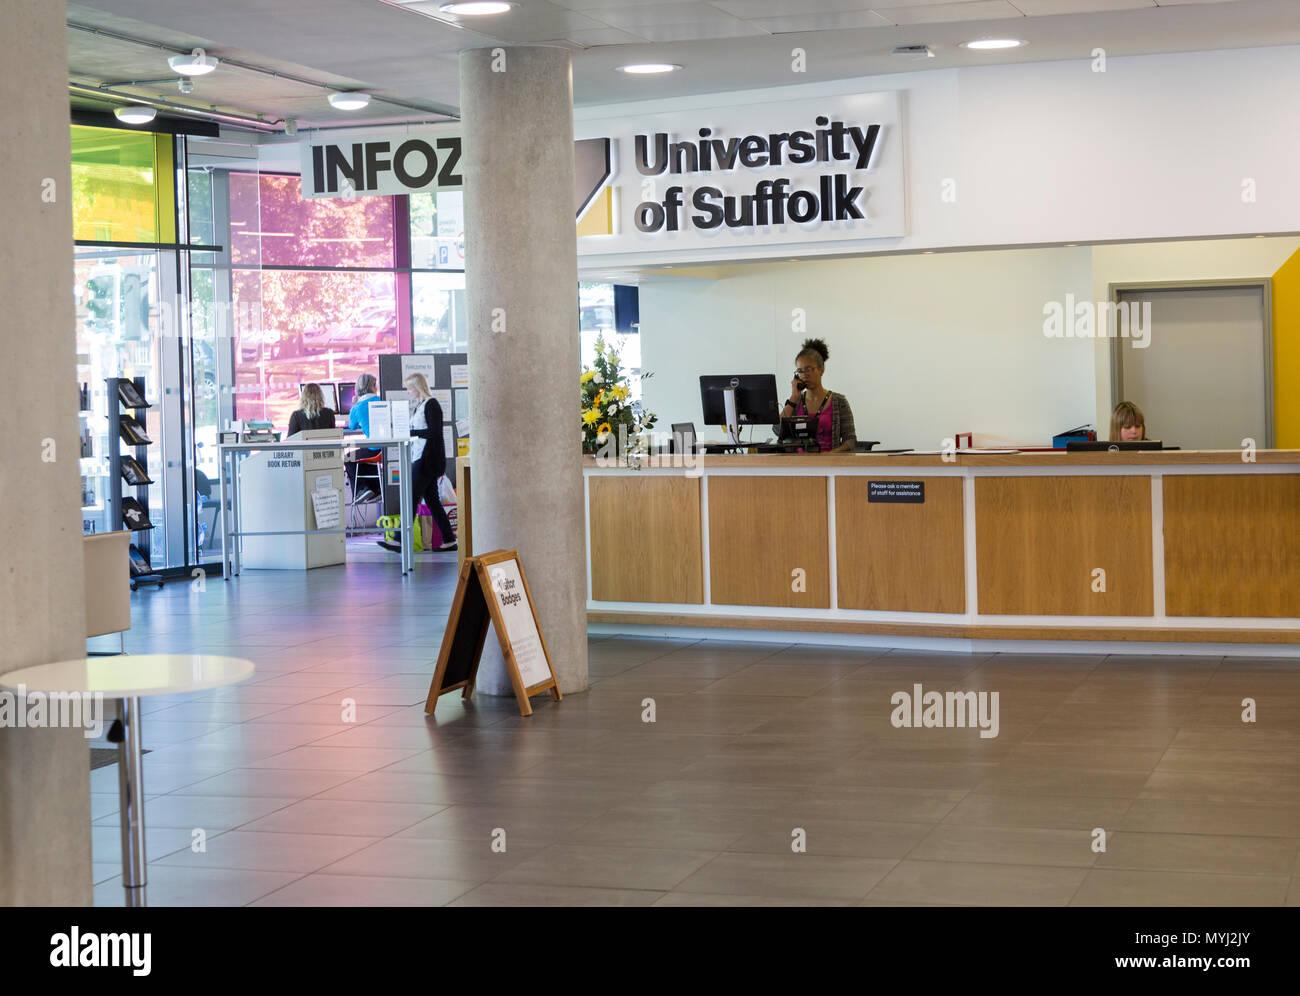 University of Suffolk INFOZONE reception area, Ipswich, Suffolk, England, UK - Stock Image